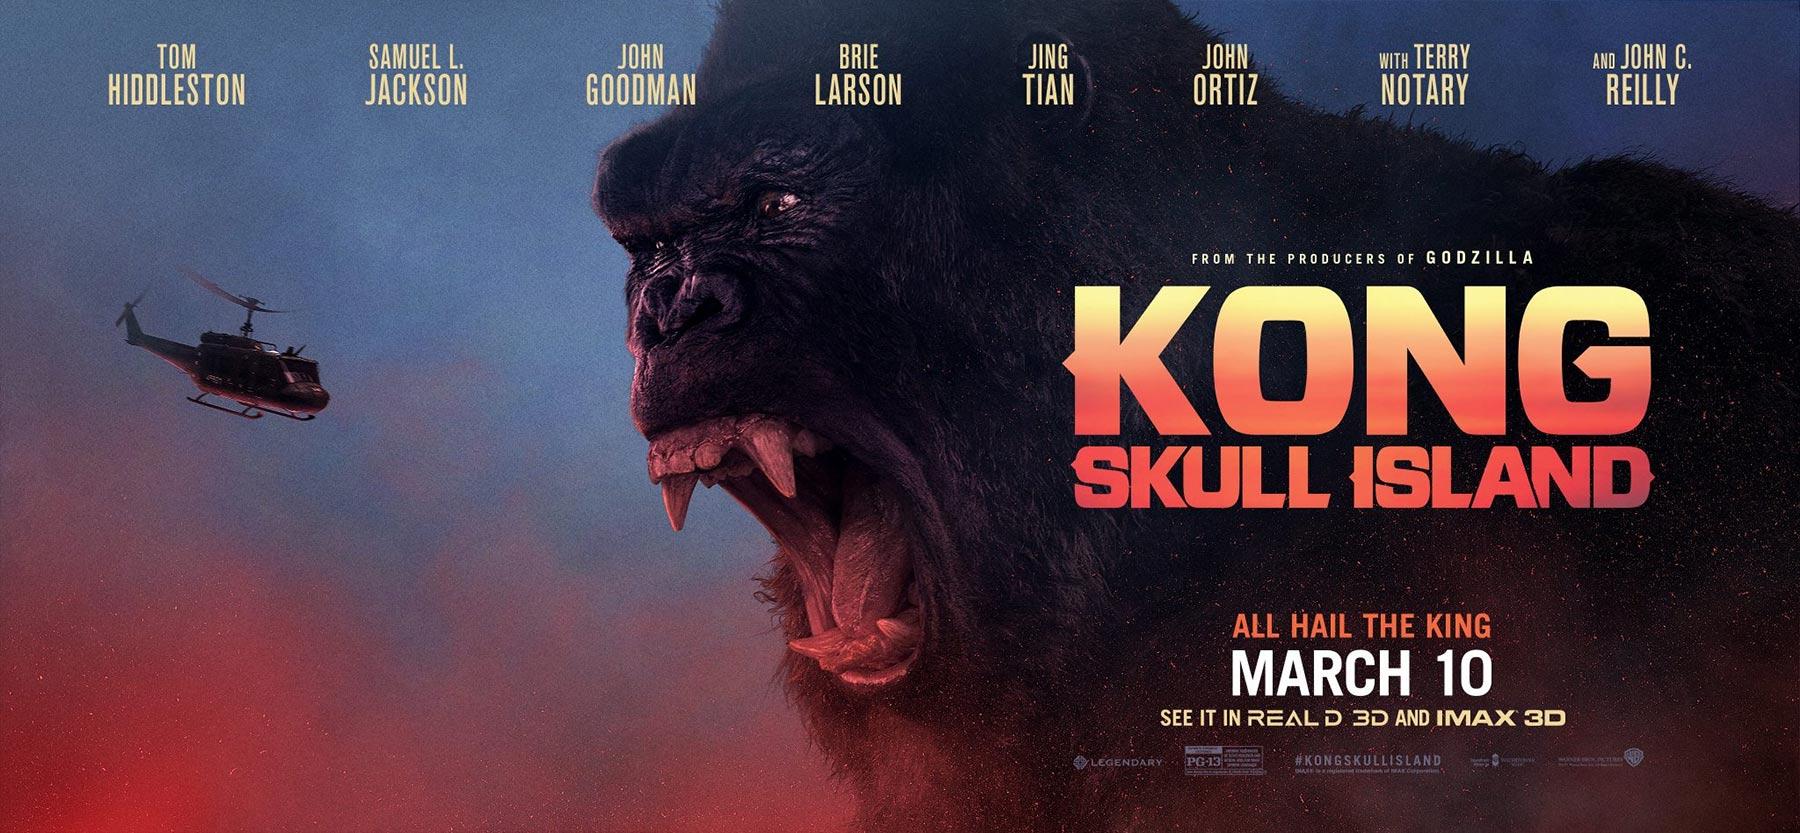 Kong: Skull Island Poster #6